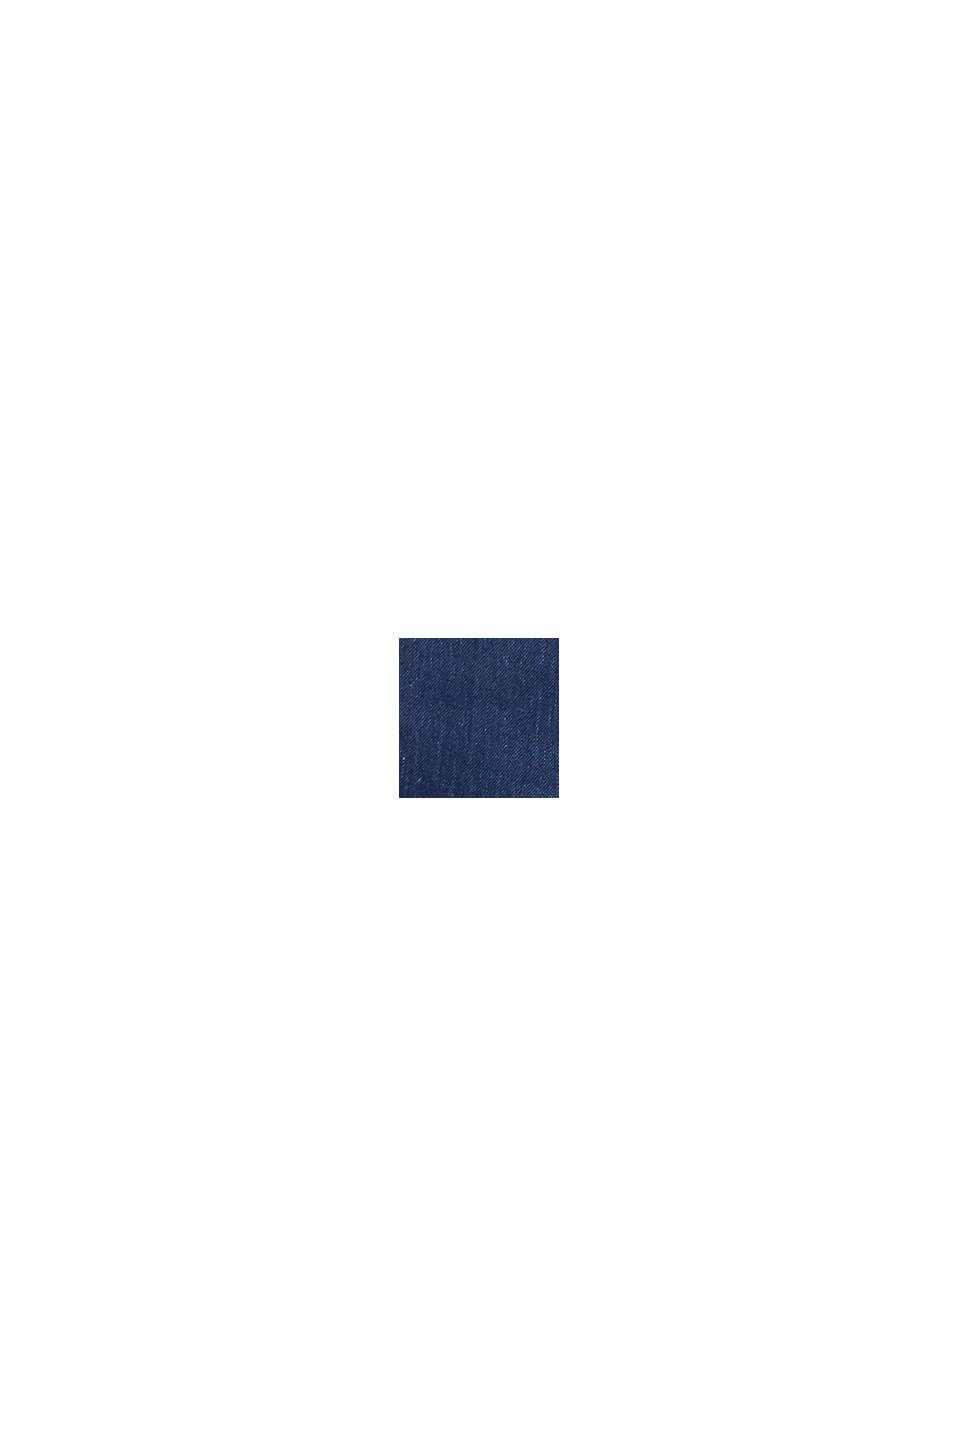 FIL-A-FIL In misto lino: giacca da completo, DARK BLUE, swatch